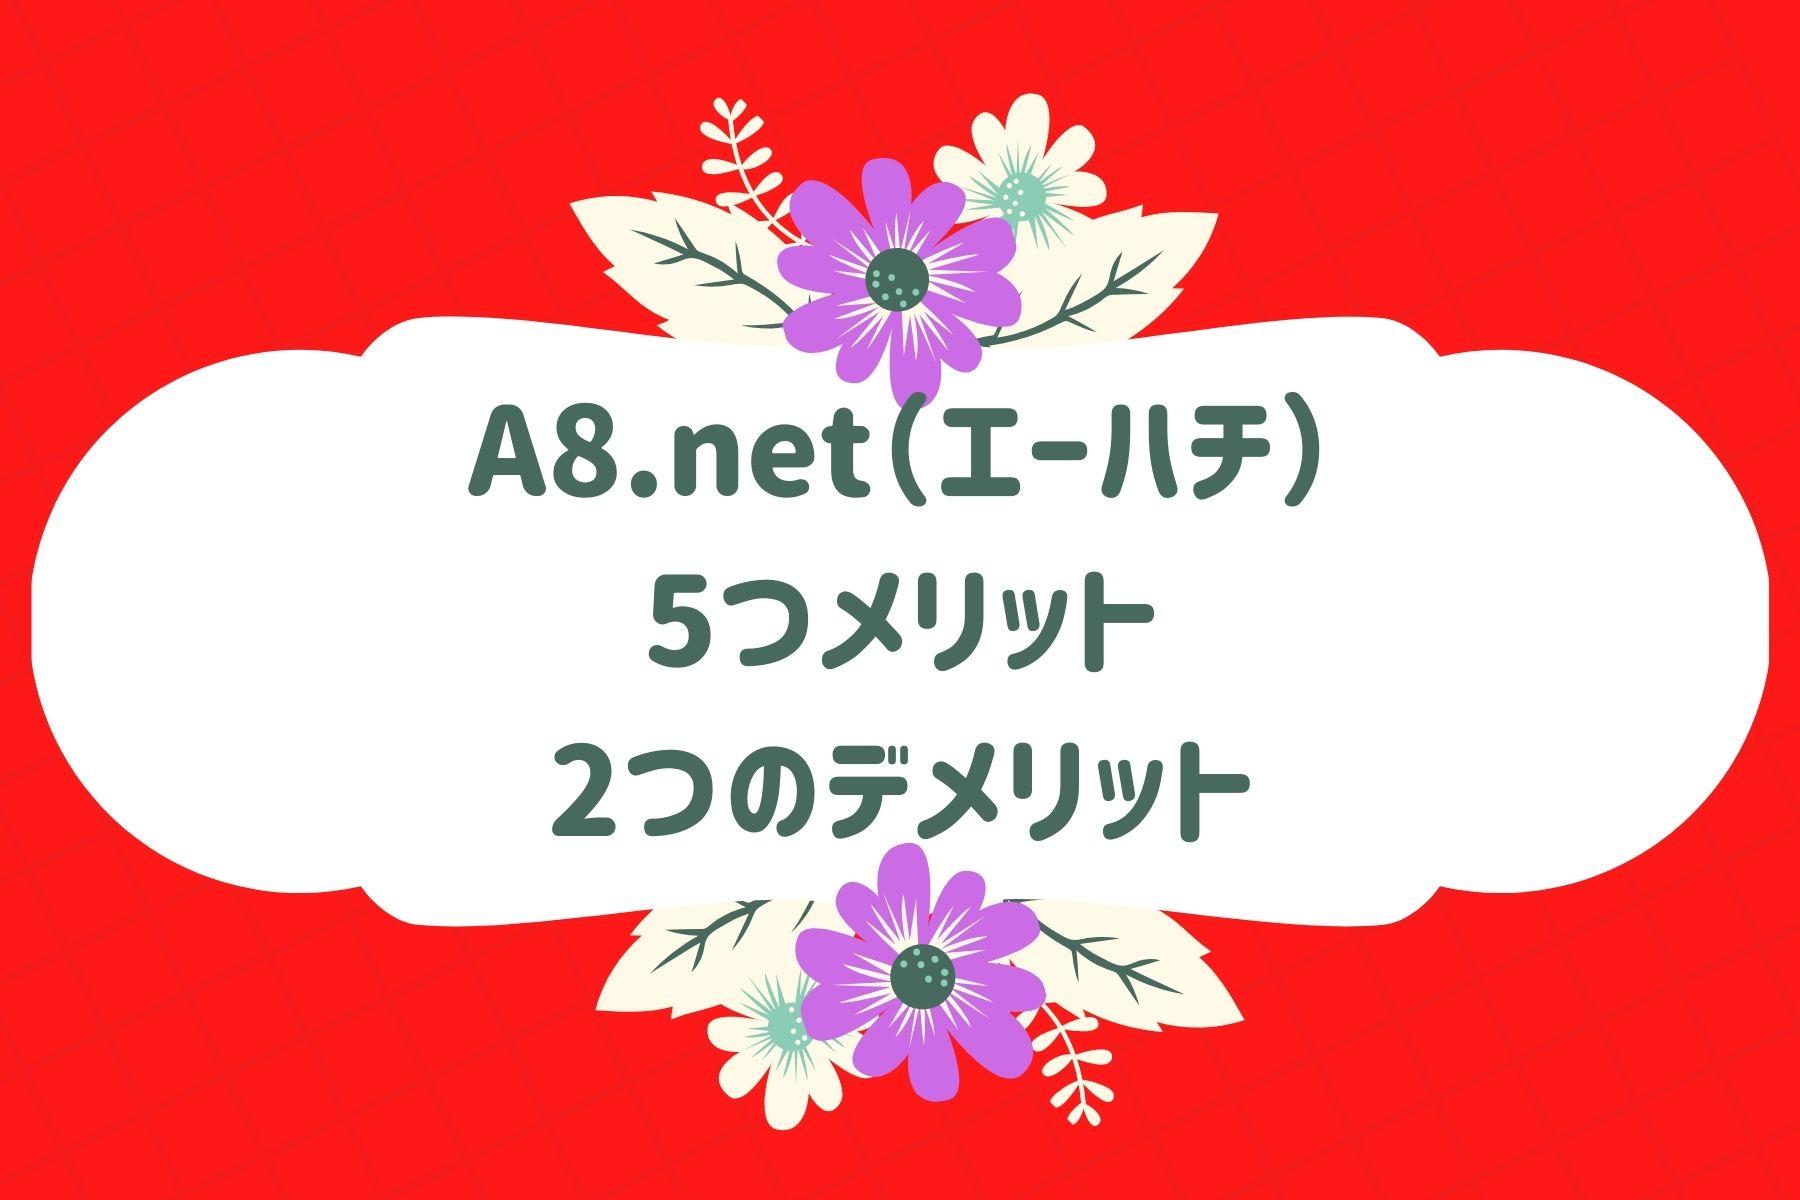 A8.net(エーハチ)の5つメリットと2つのデメリット